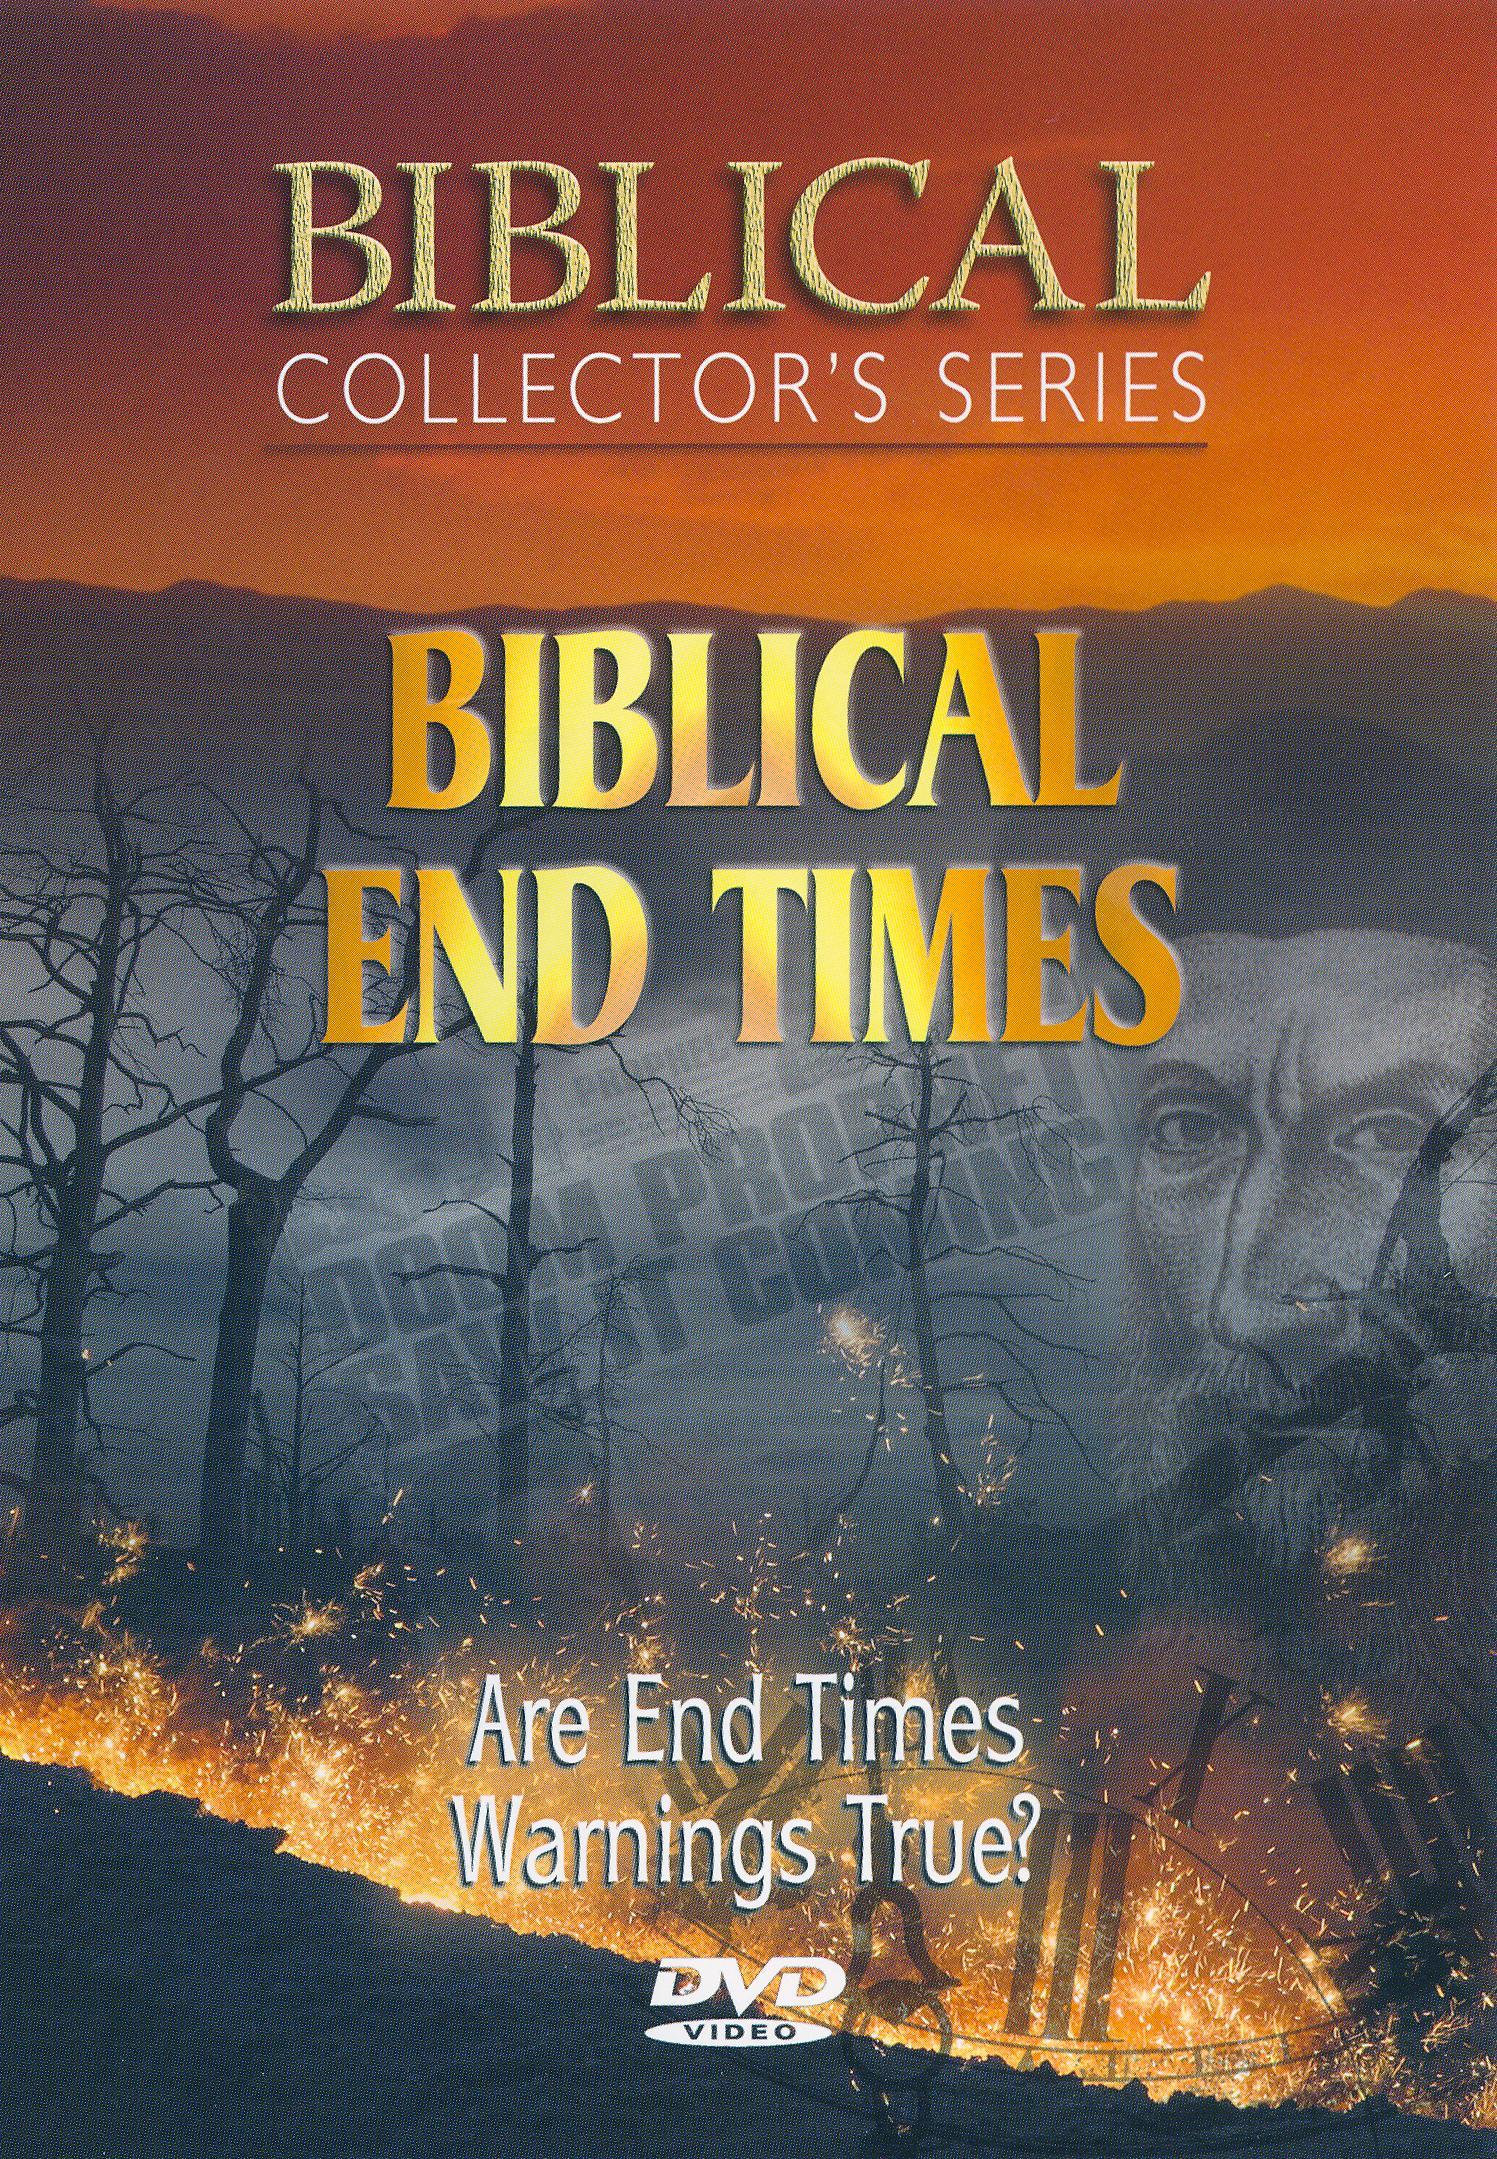 Biblical Collector's Series: Biblical End Times